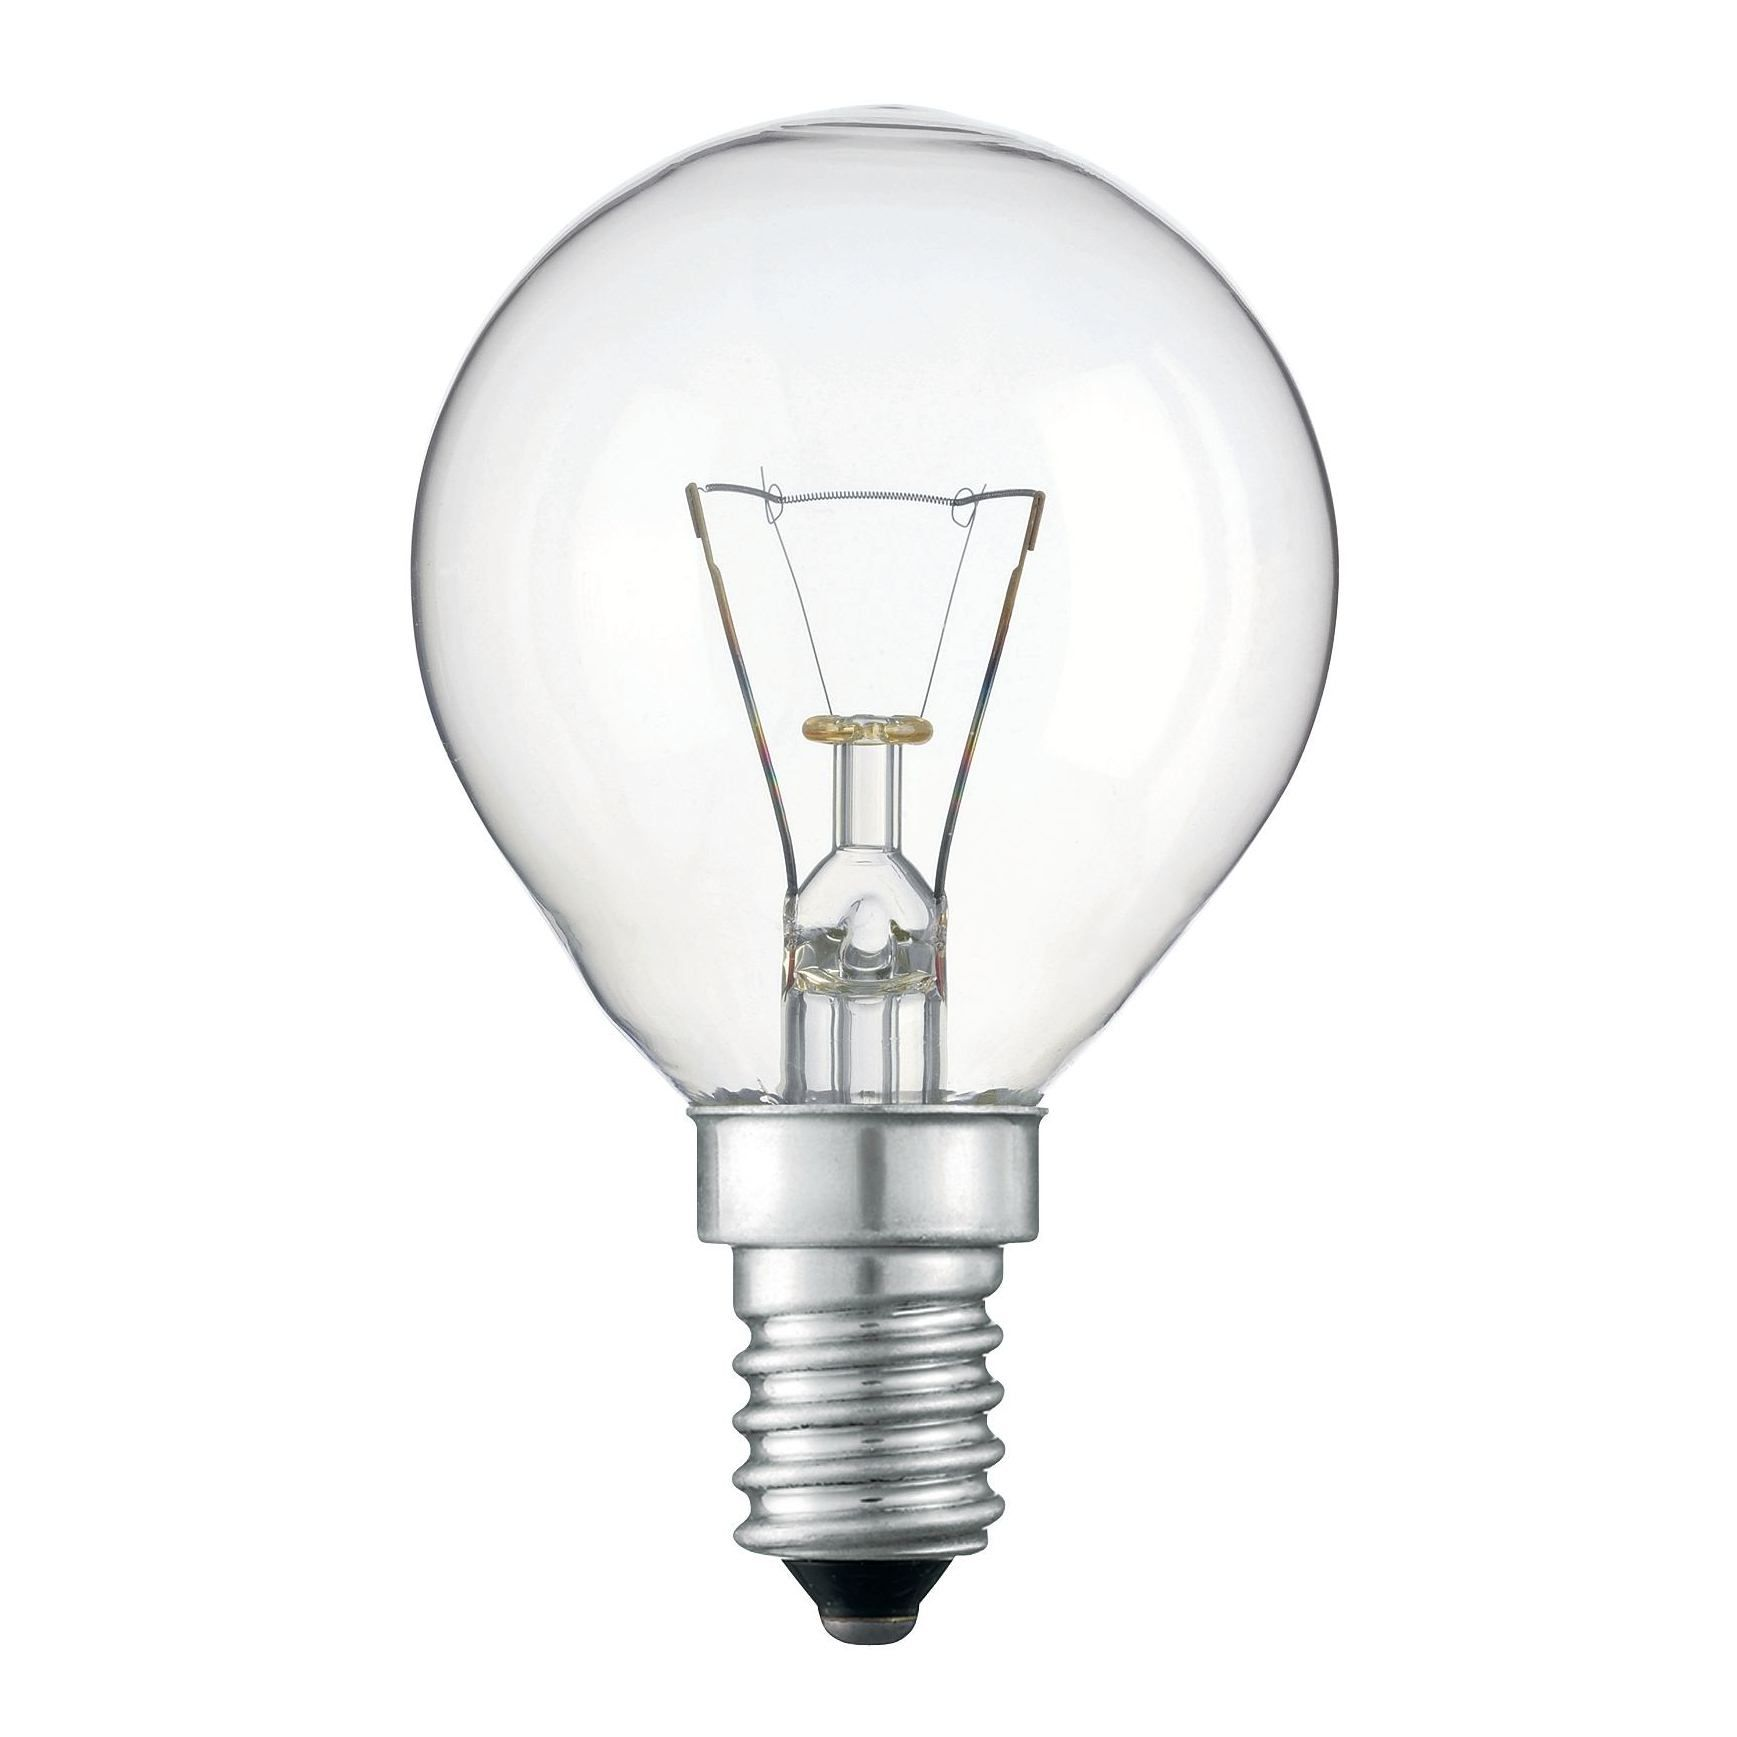 Купить Лампа накаливания Philips P45 60W 230V E14 CL.1CT/10X10F прозрачная